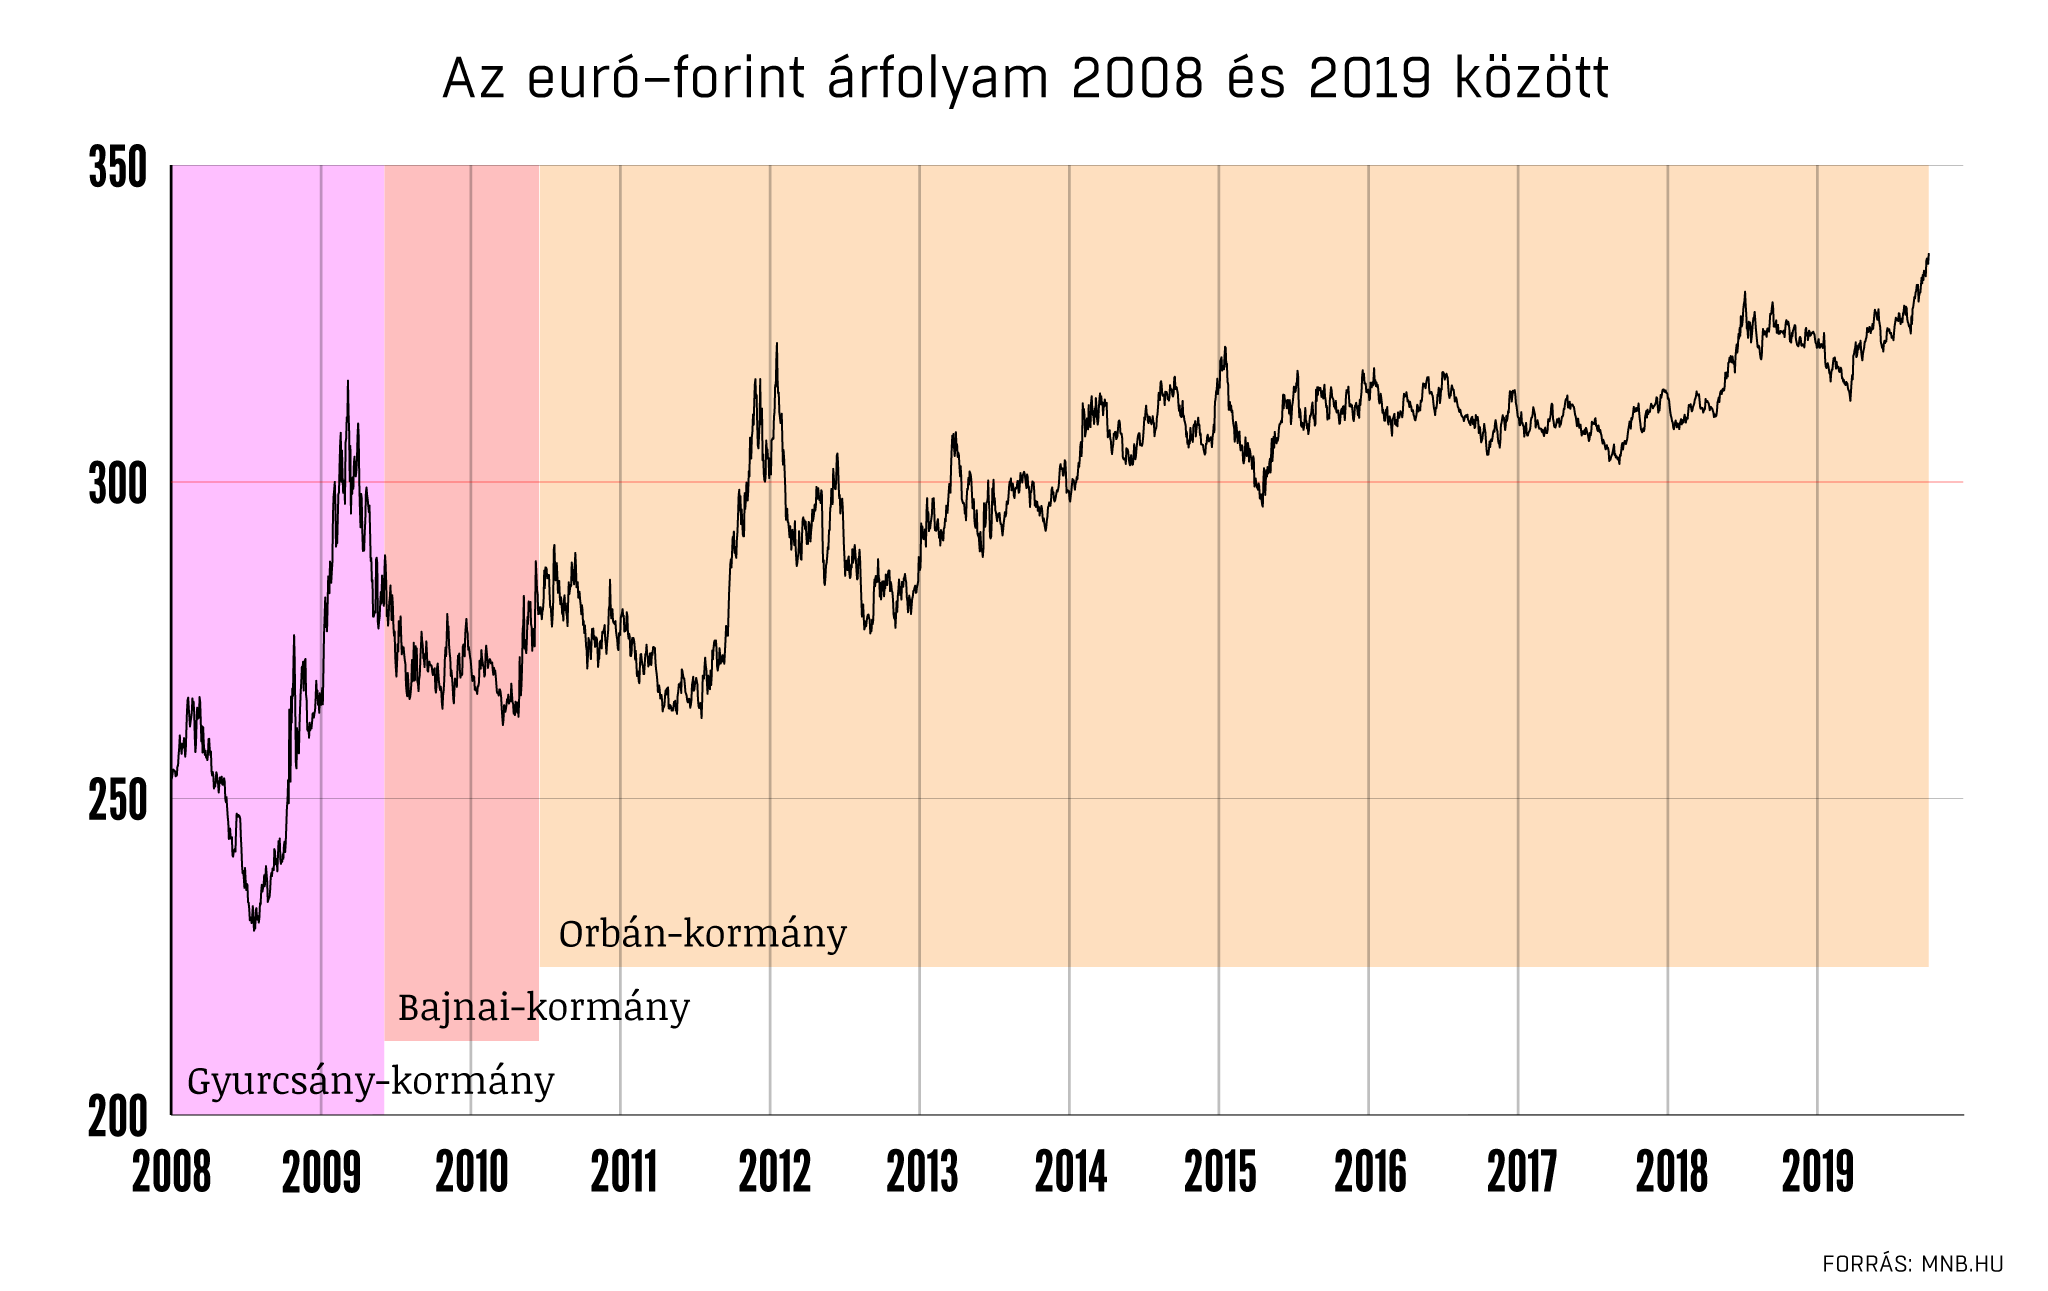 Hogyan jutottunk el a 336 forintos euróig?